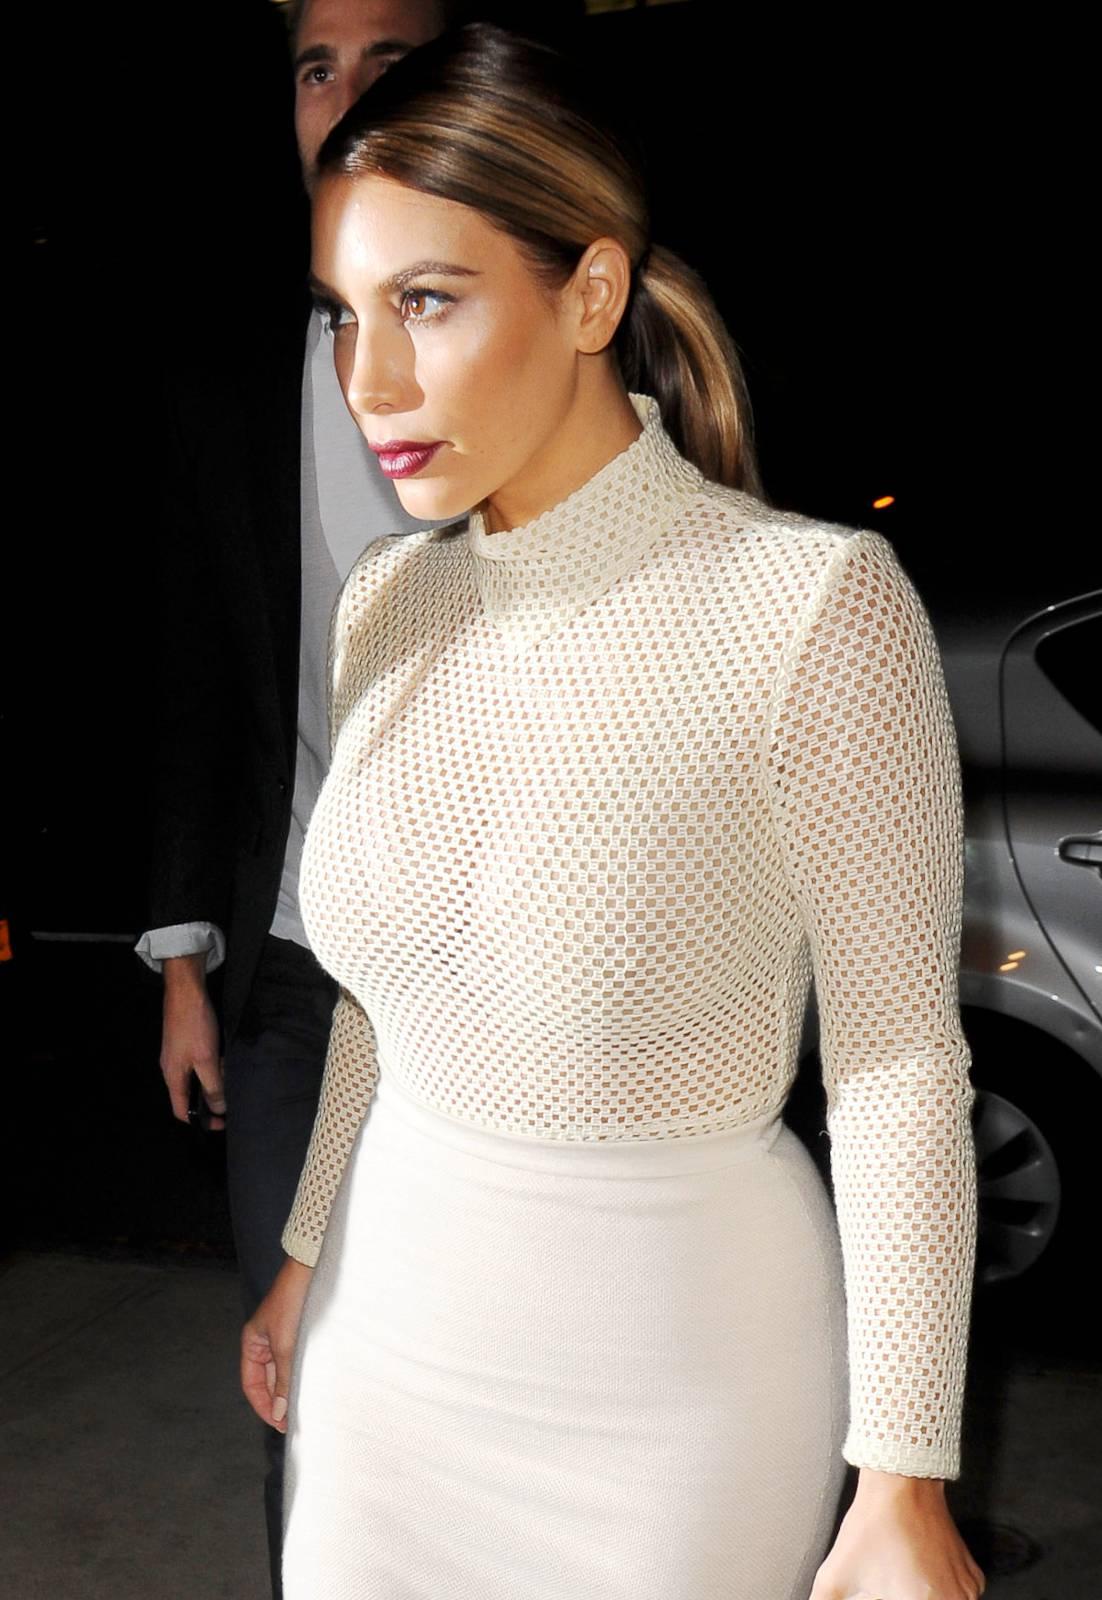 904244774_Kim_Kardashian_191113_ReSiDuO23_123_551lo.jpg